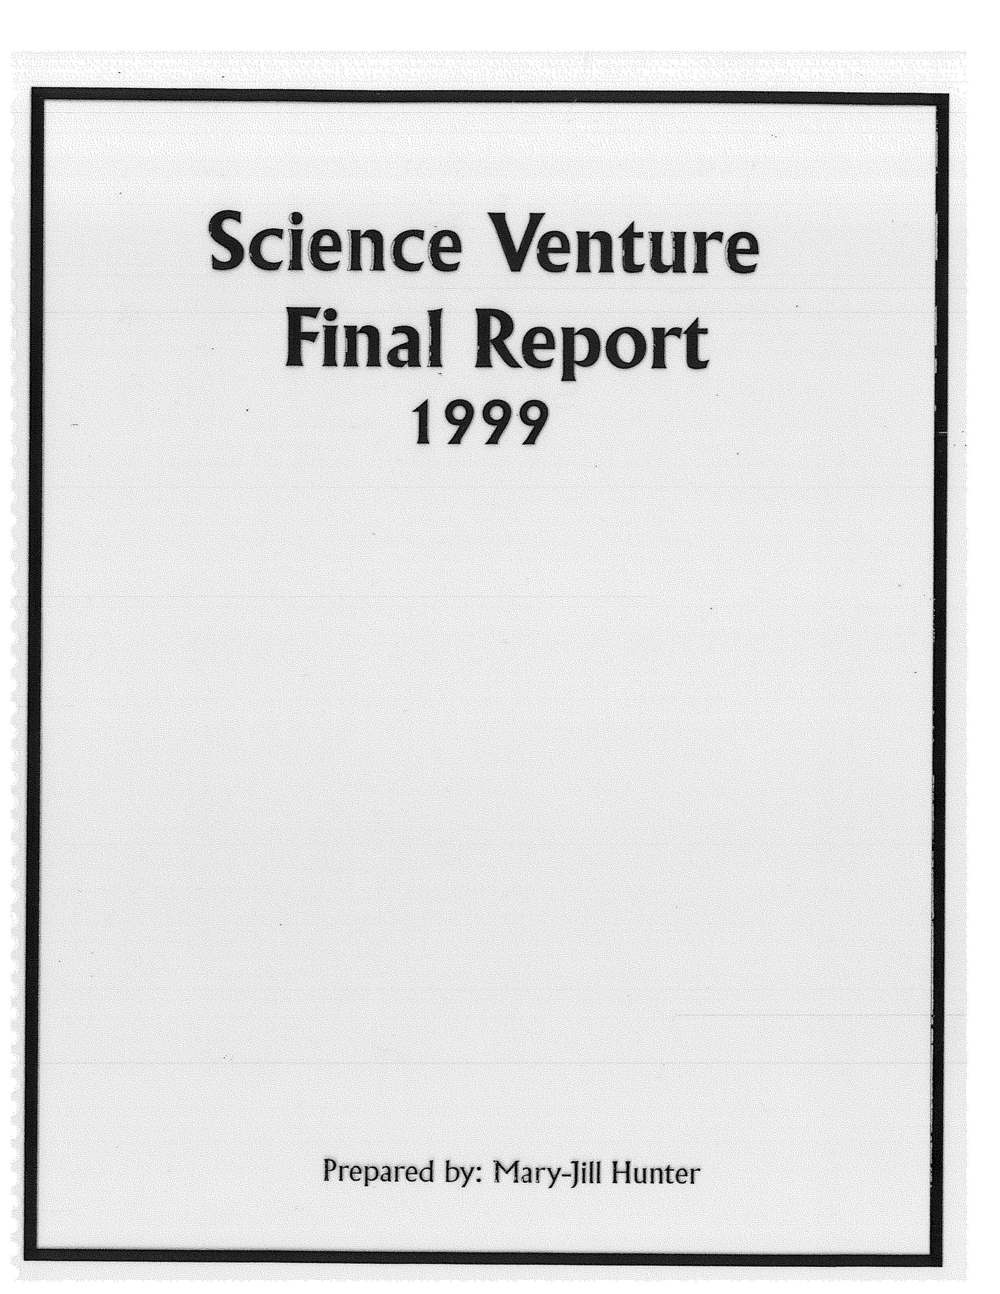 Final_Report_1999.jpg